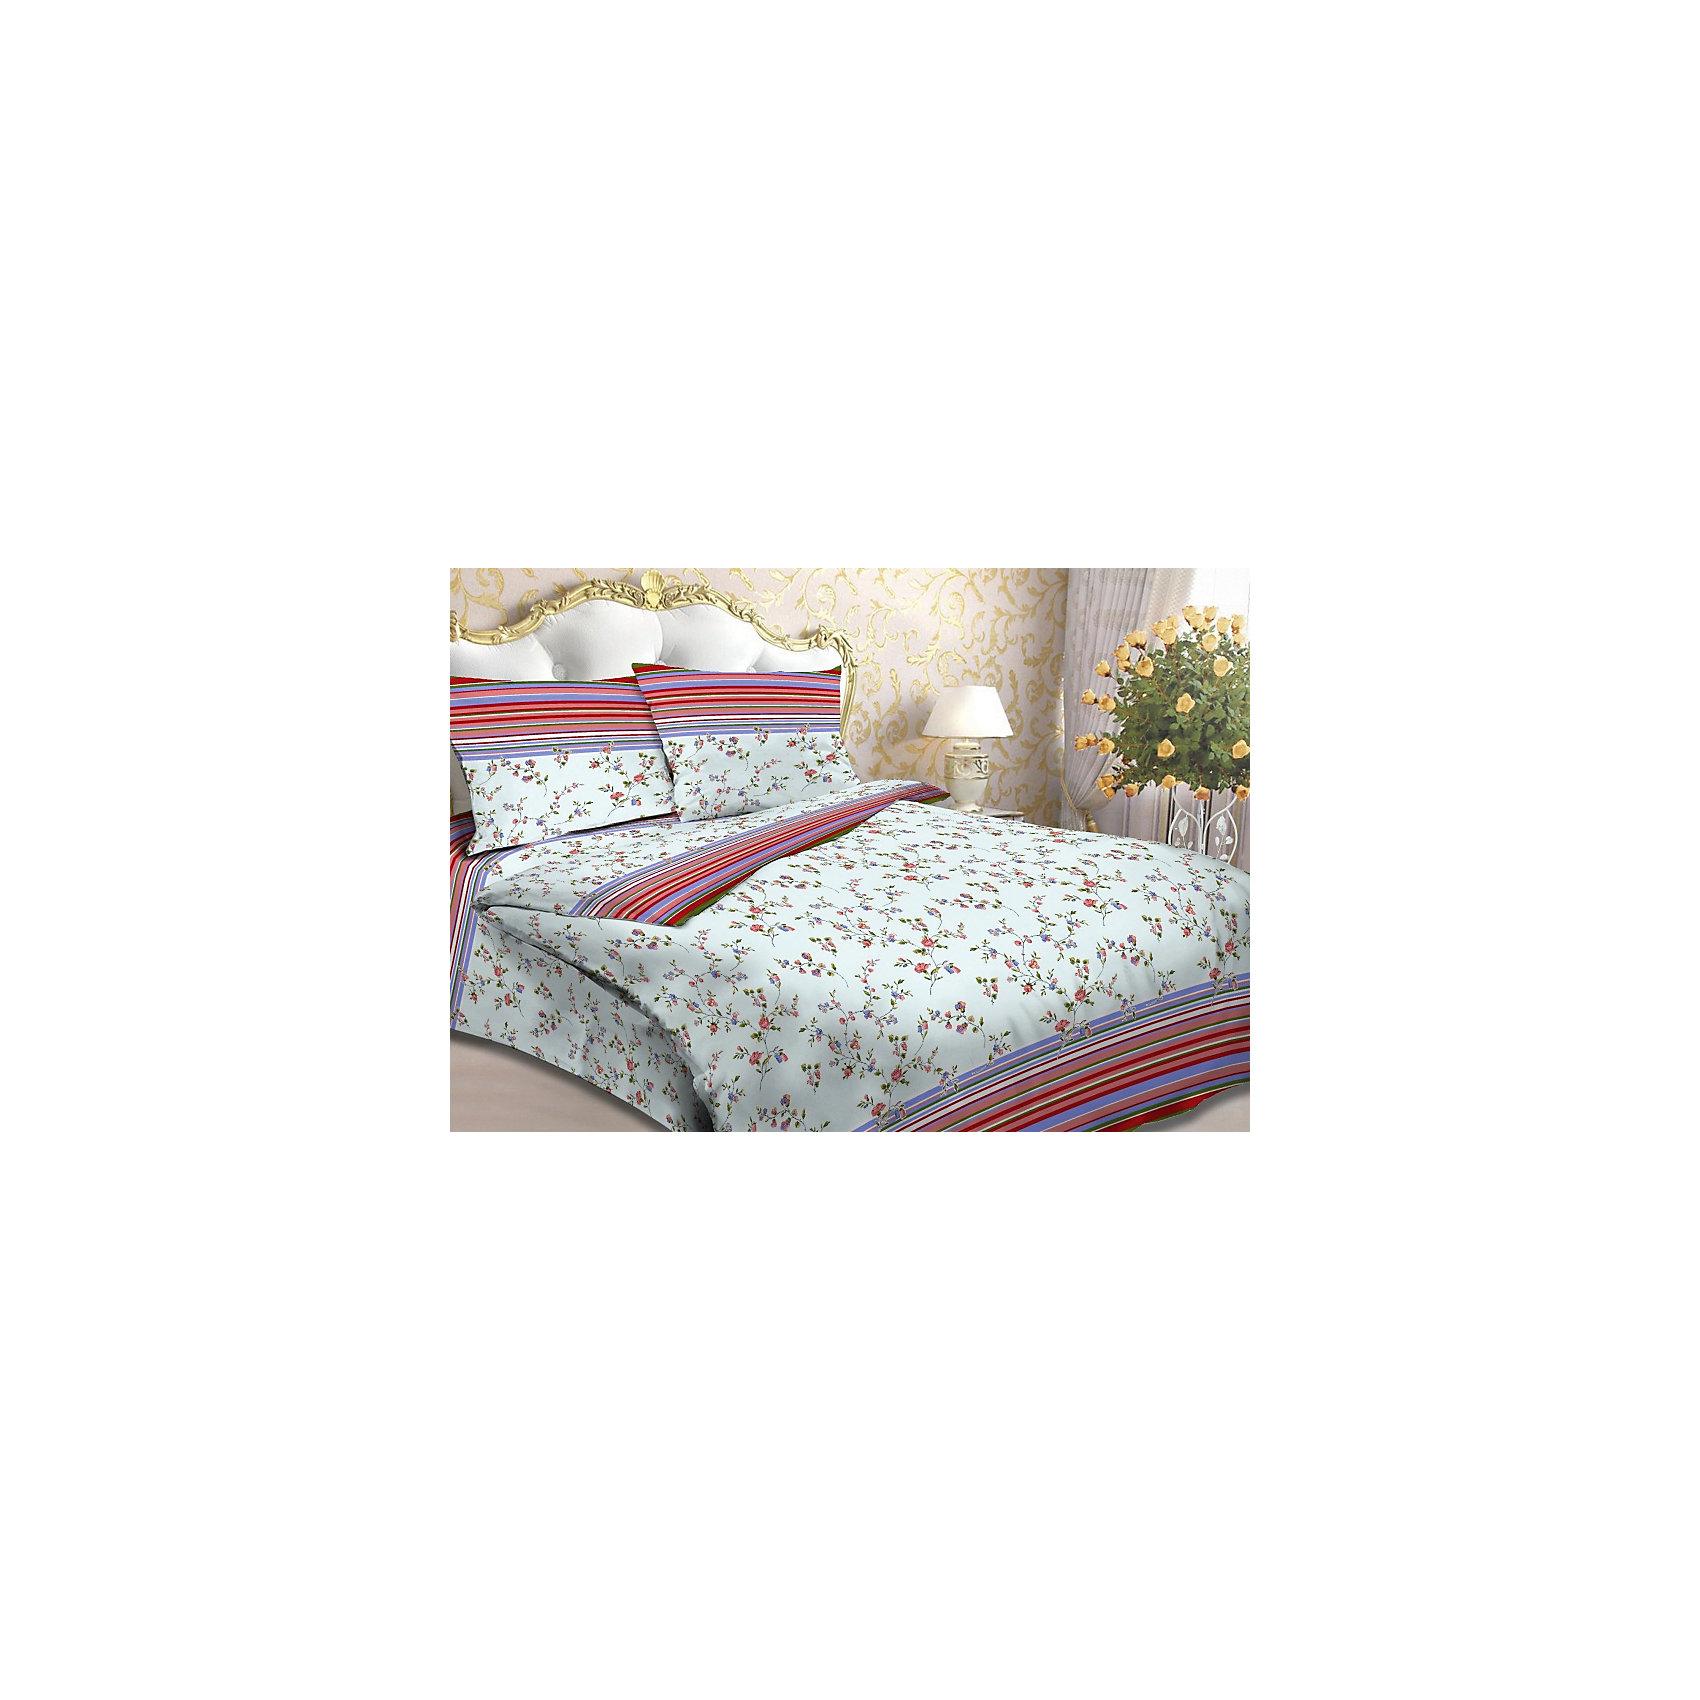 Letto Постельное белье 2,0 сп. B13 бязь, (нав.70х70), Letto комплект белья letto 2 спальное наволочки 70х70 цвет сиреневый в39 4